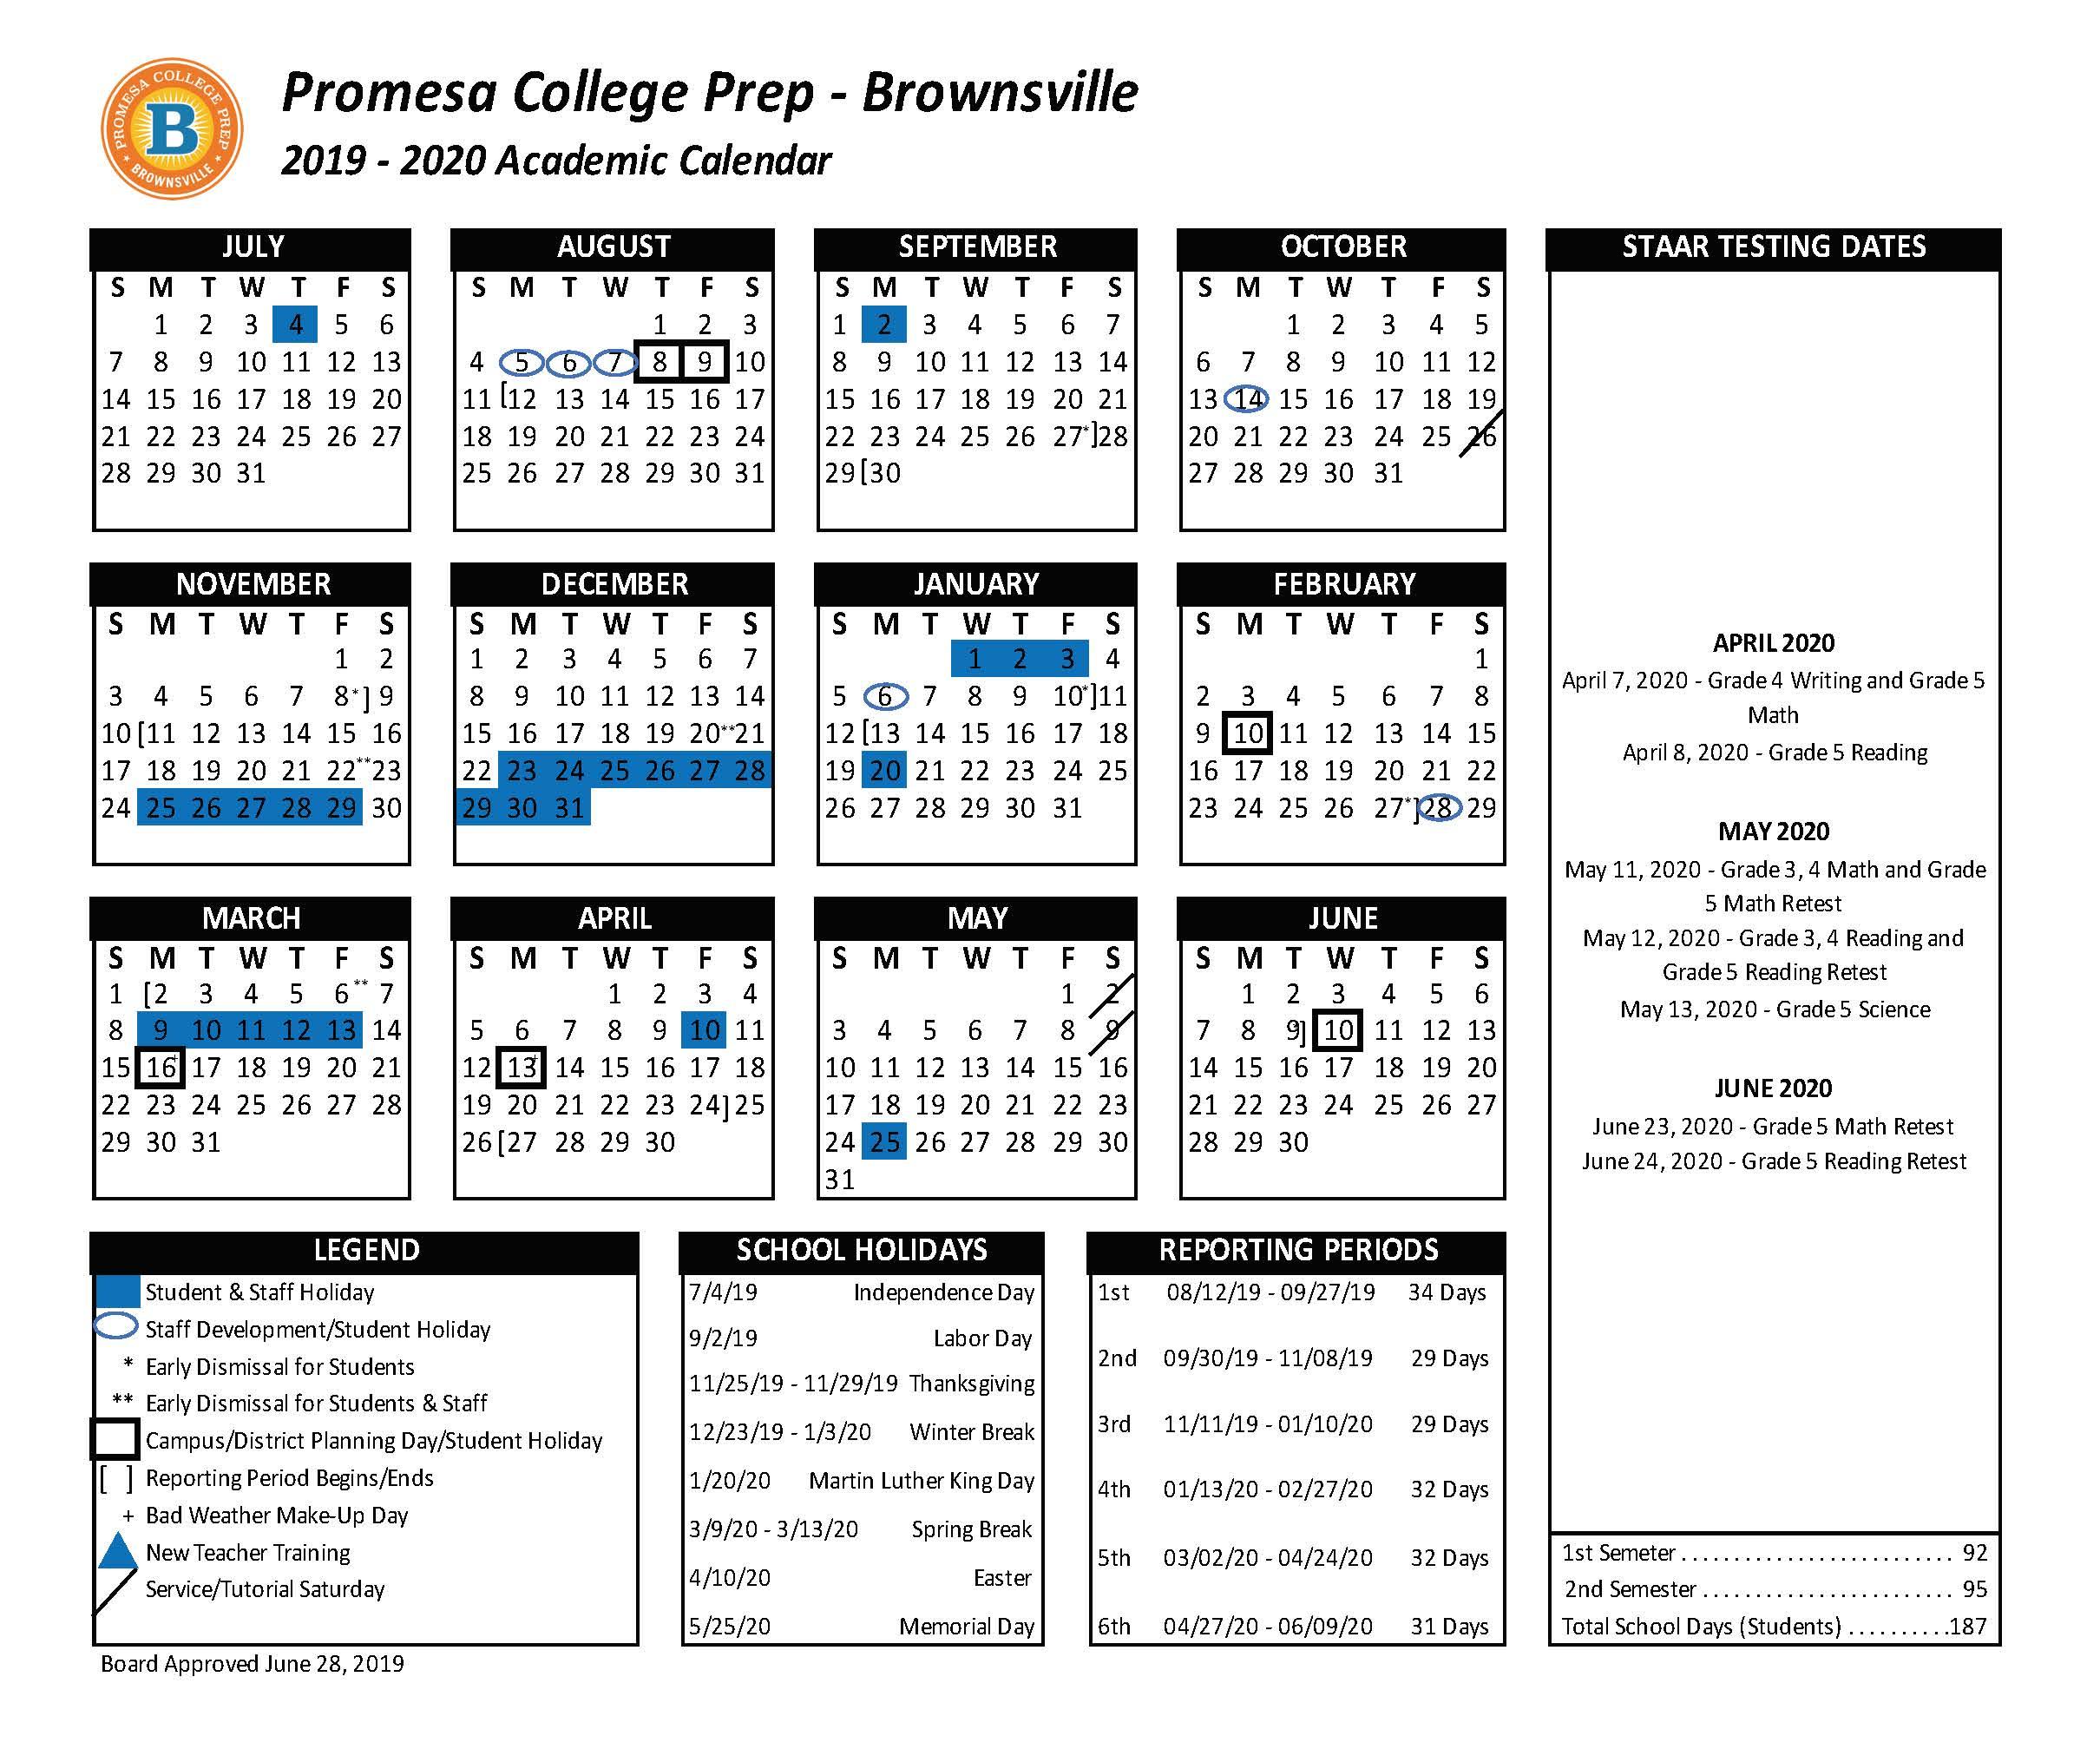 Brownsville Isd Calendar 2021 | Printable Calendar 2020-2021 regarding American River College Academic Calendar 2021